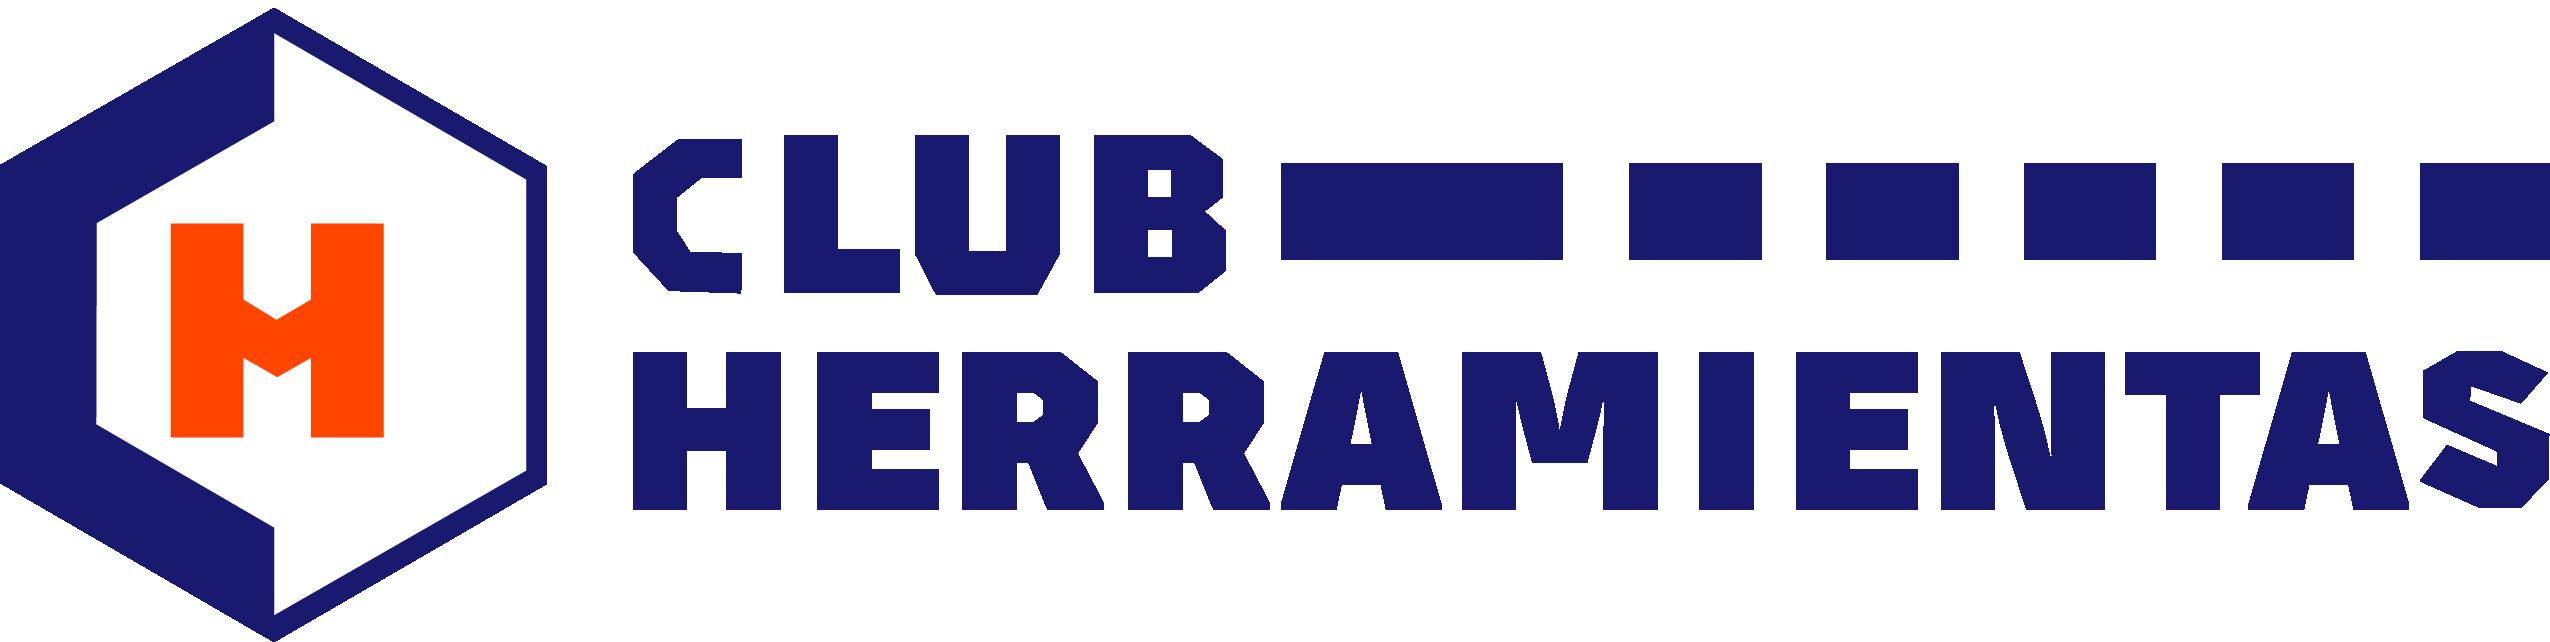 clubherramientas.cl